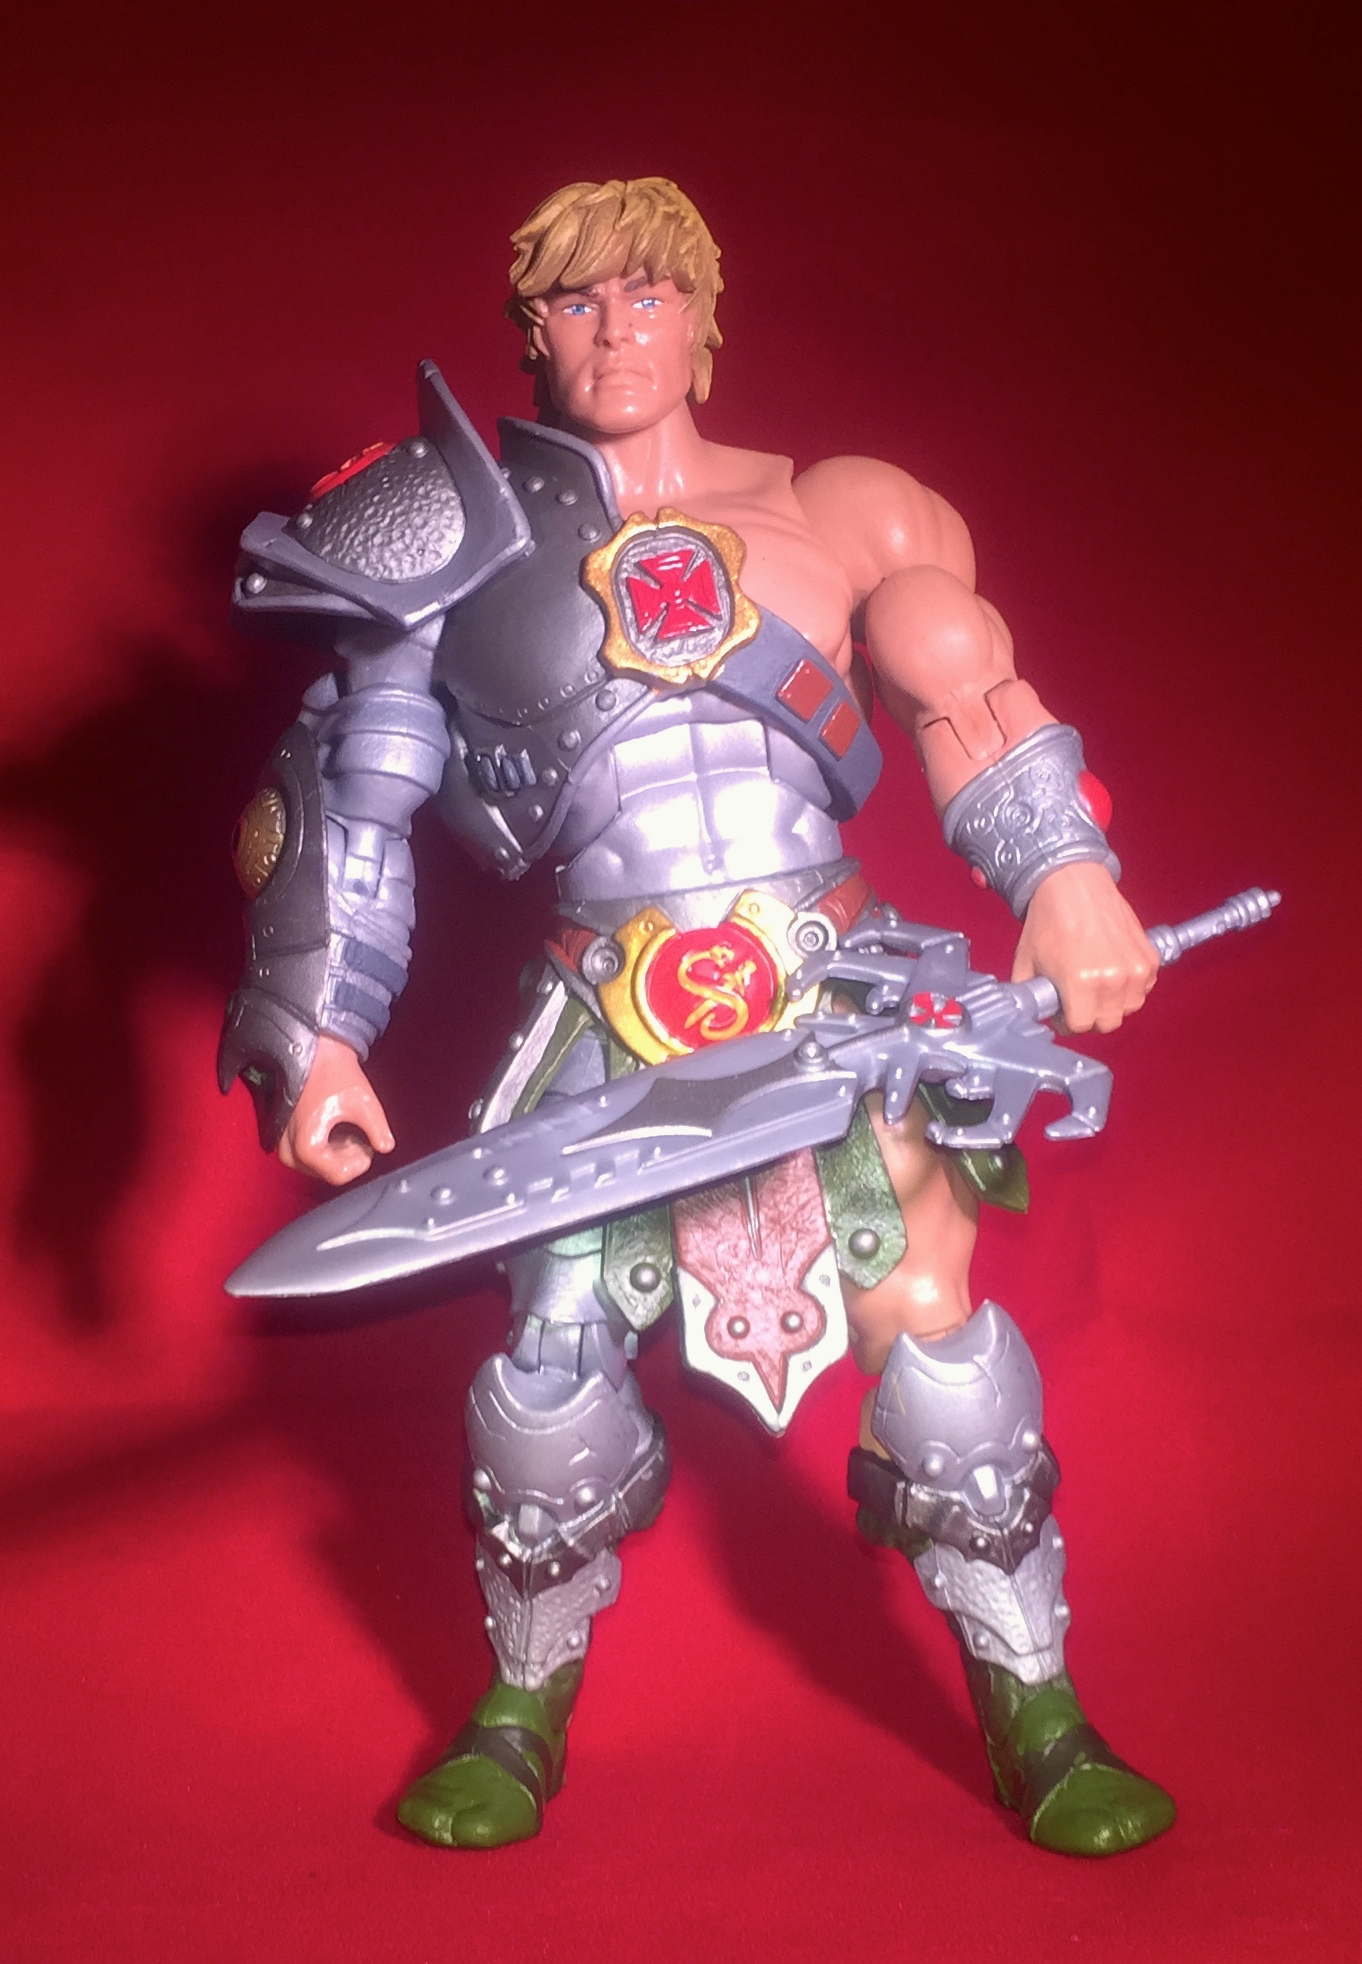 Pré-commande Vintage Masters Of The Universe Custom Teela Armor Staff Shield Gold Set He-man Masters